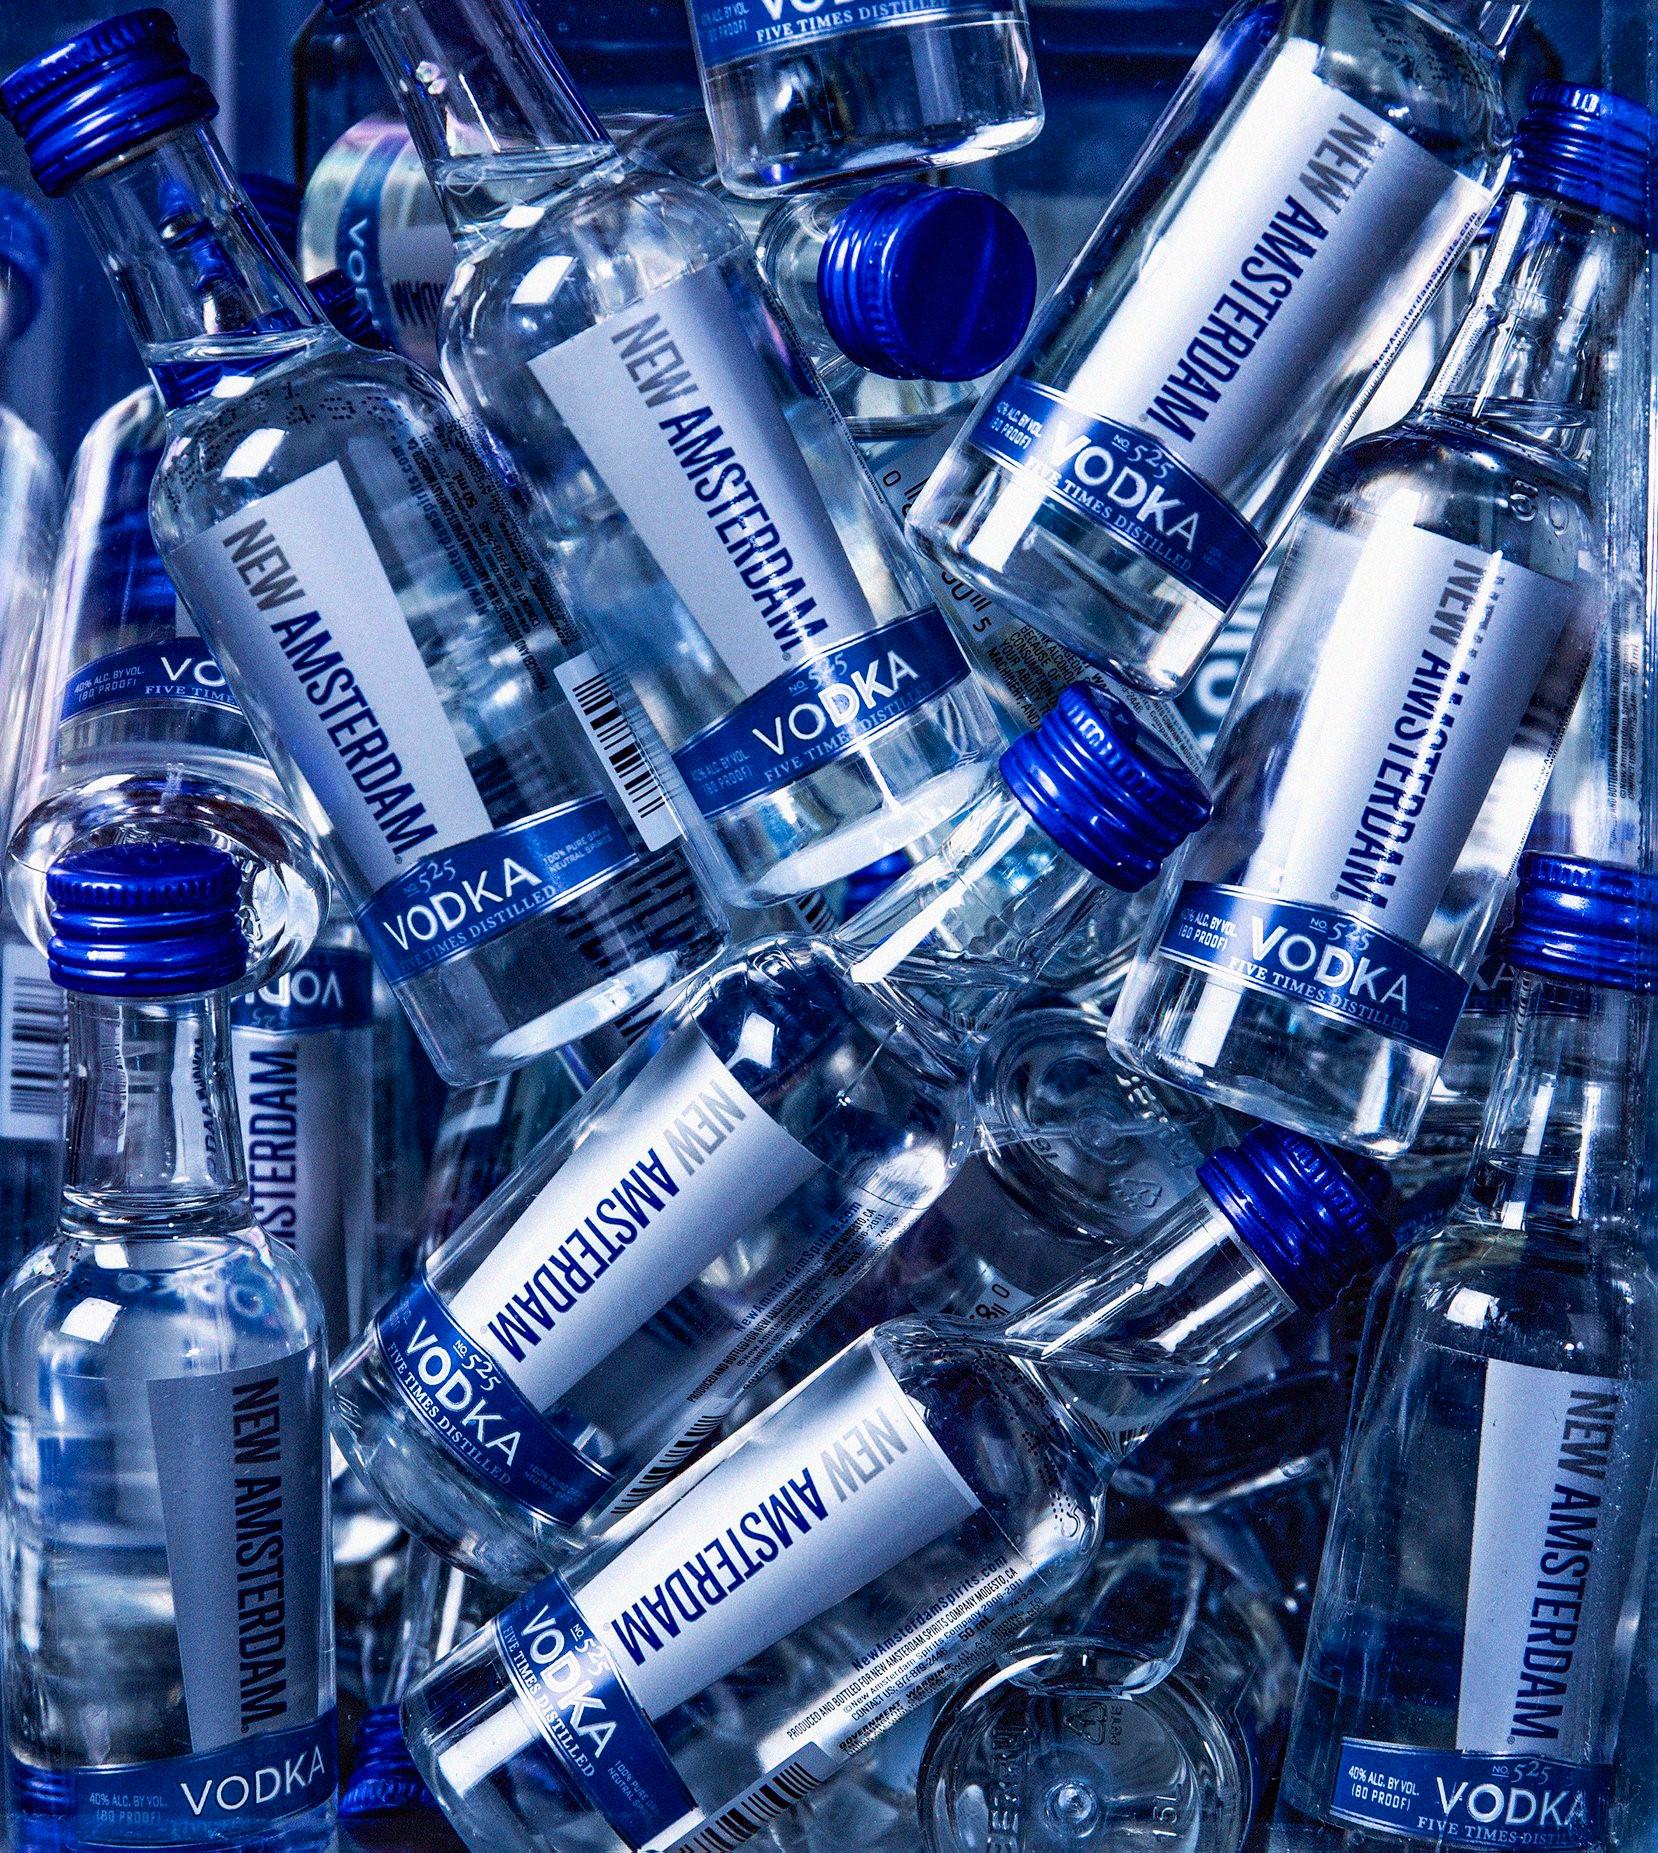 several bottles of New Amsterdam. Visit our Instagram.